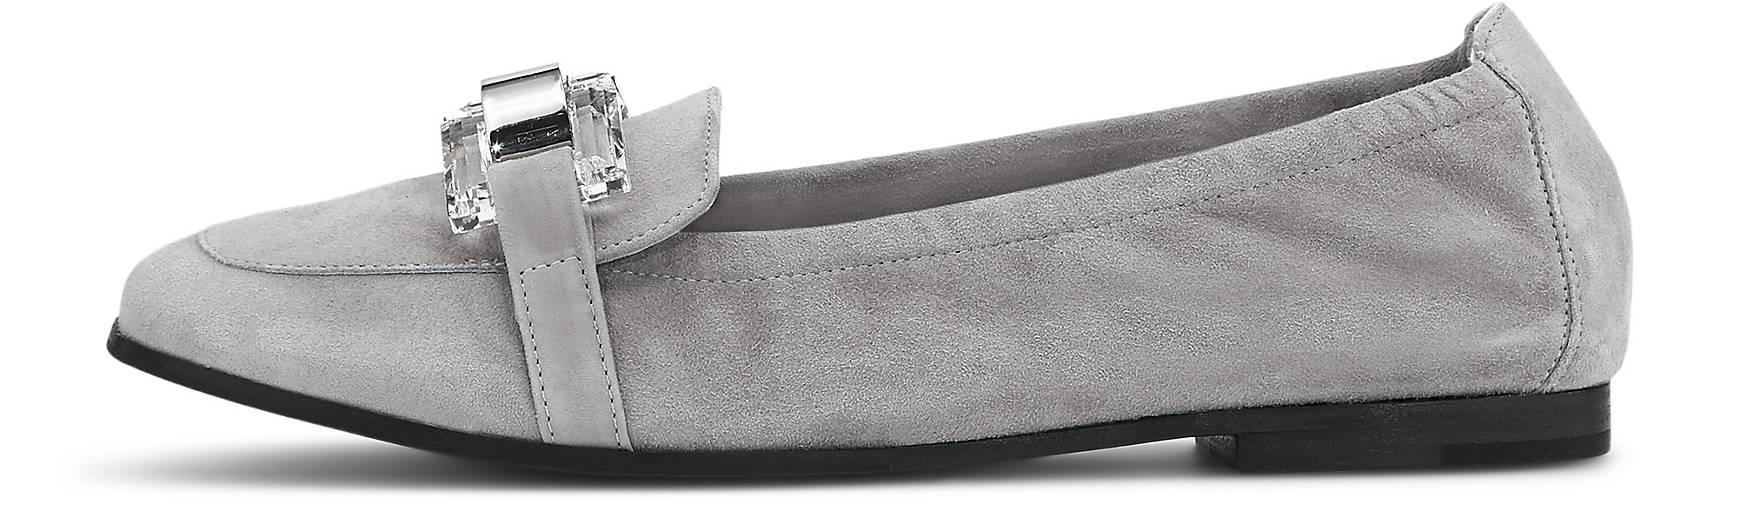 Kennel & Schmenger Fashion-Slipper NINA